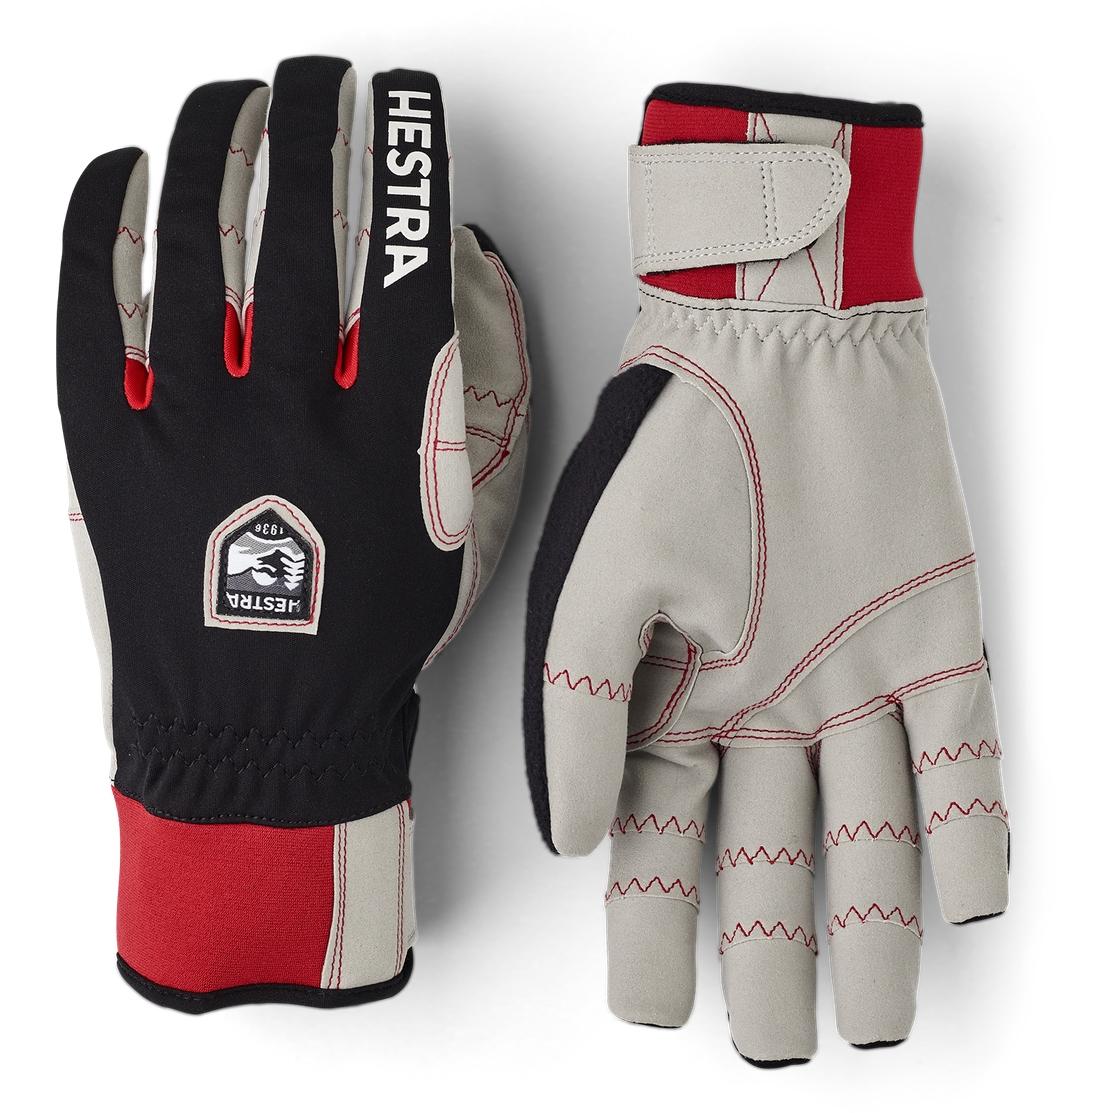 Picture of Hestra Ergo Grip Windstopper Race - 5 Finger Cross Country Gloves - black